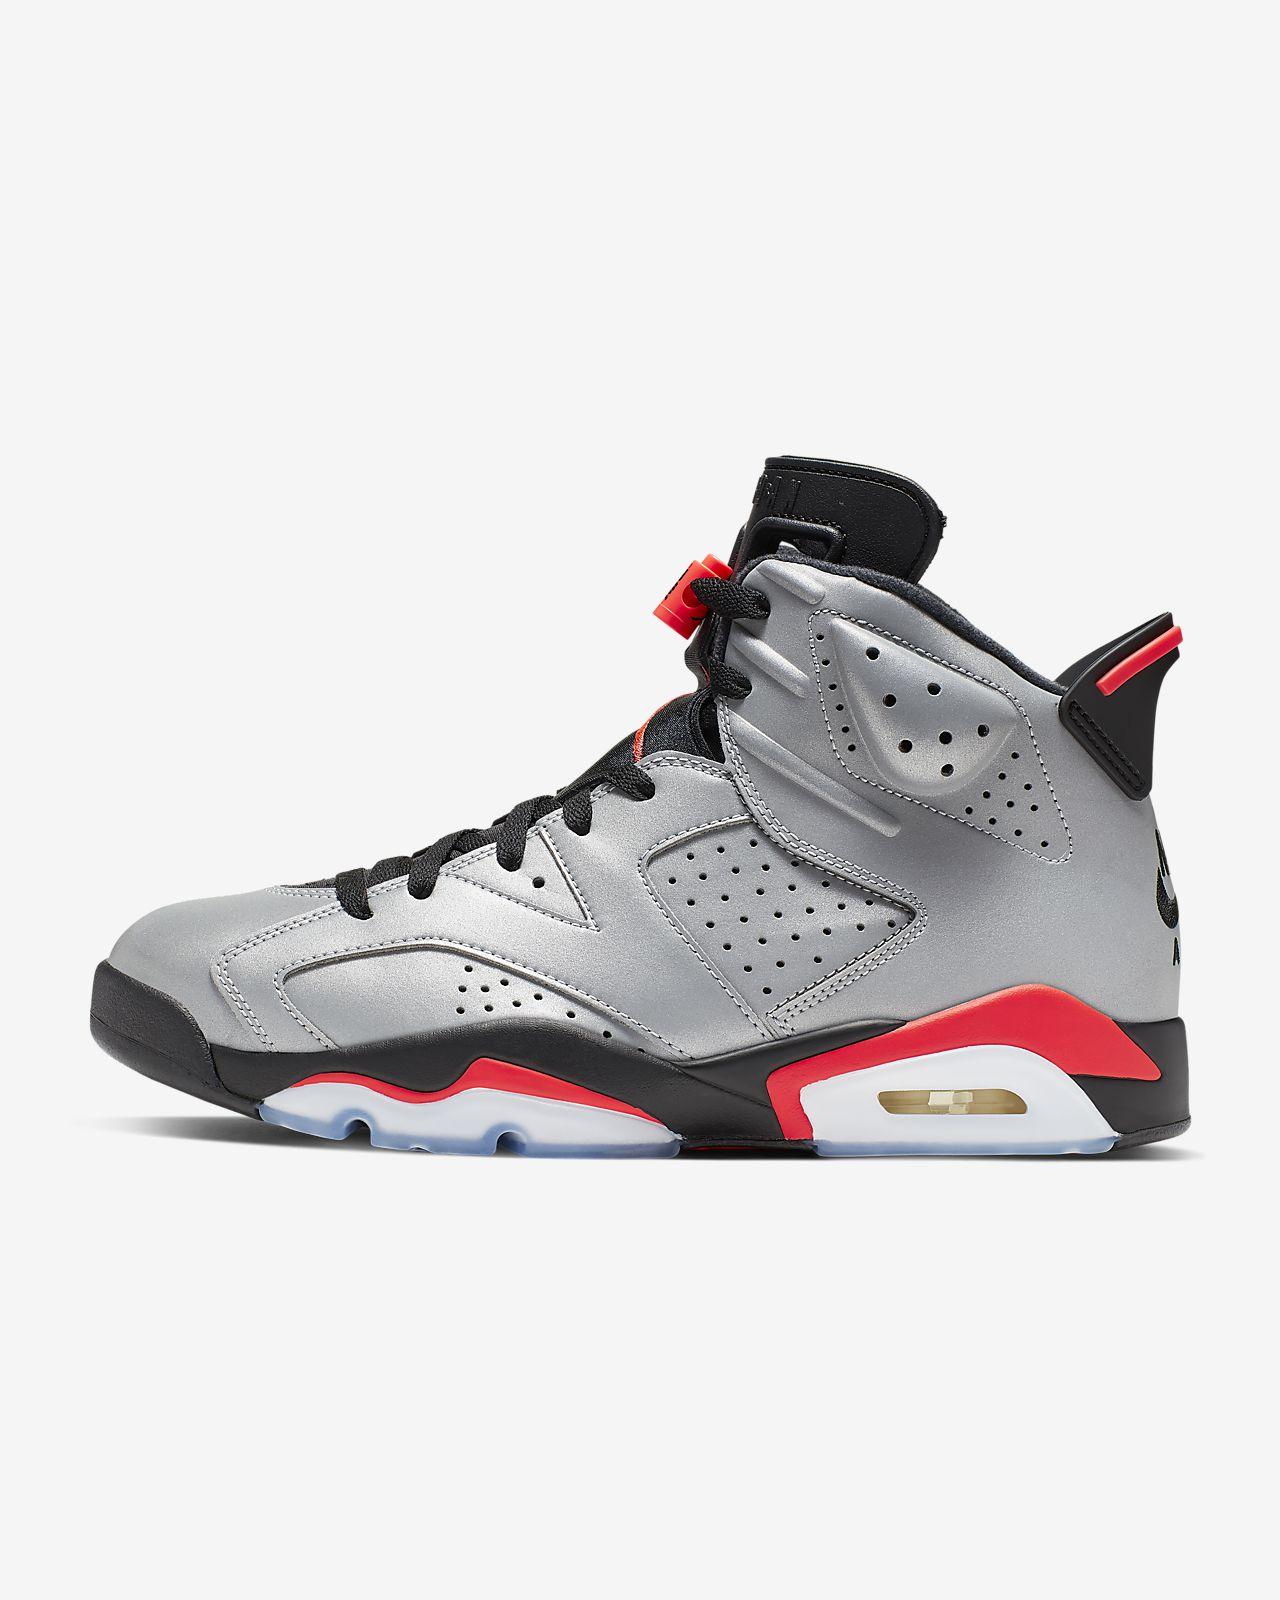 Air Jordan 6 Retro SP Men's Shoe